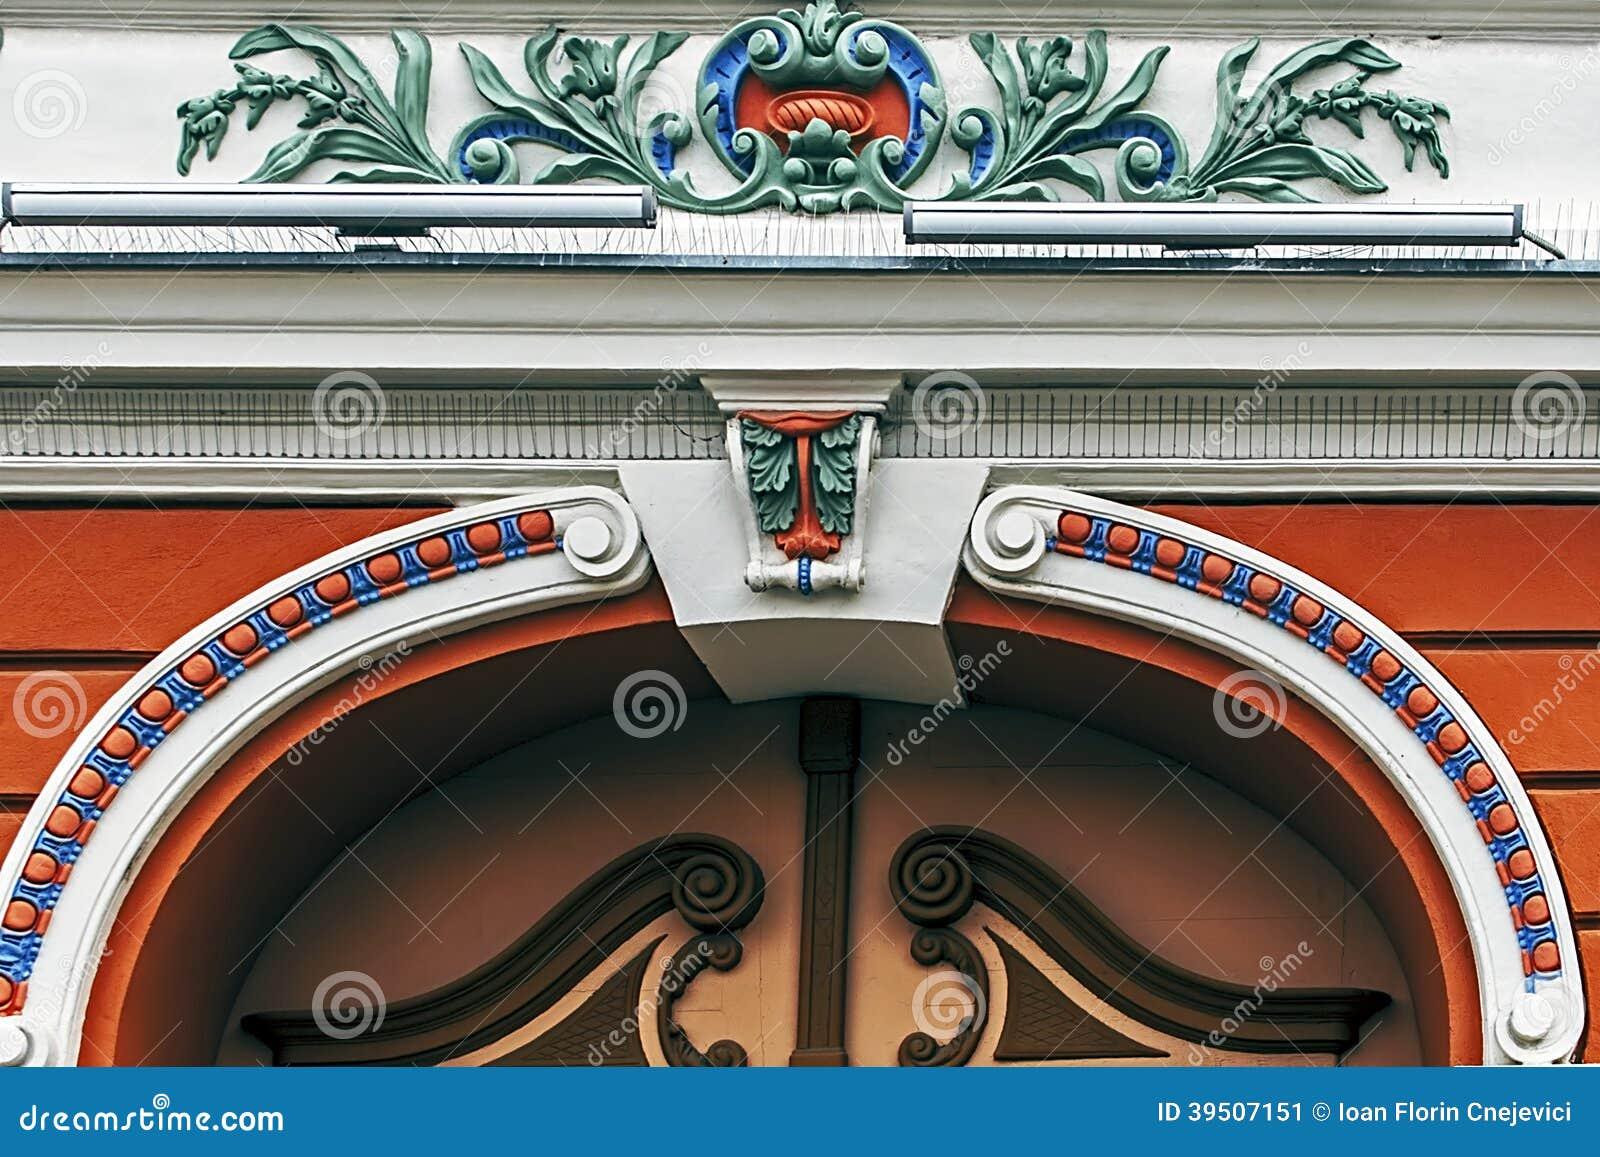 Architectural Detail 1